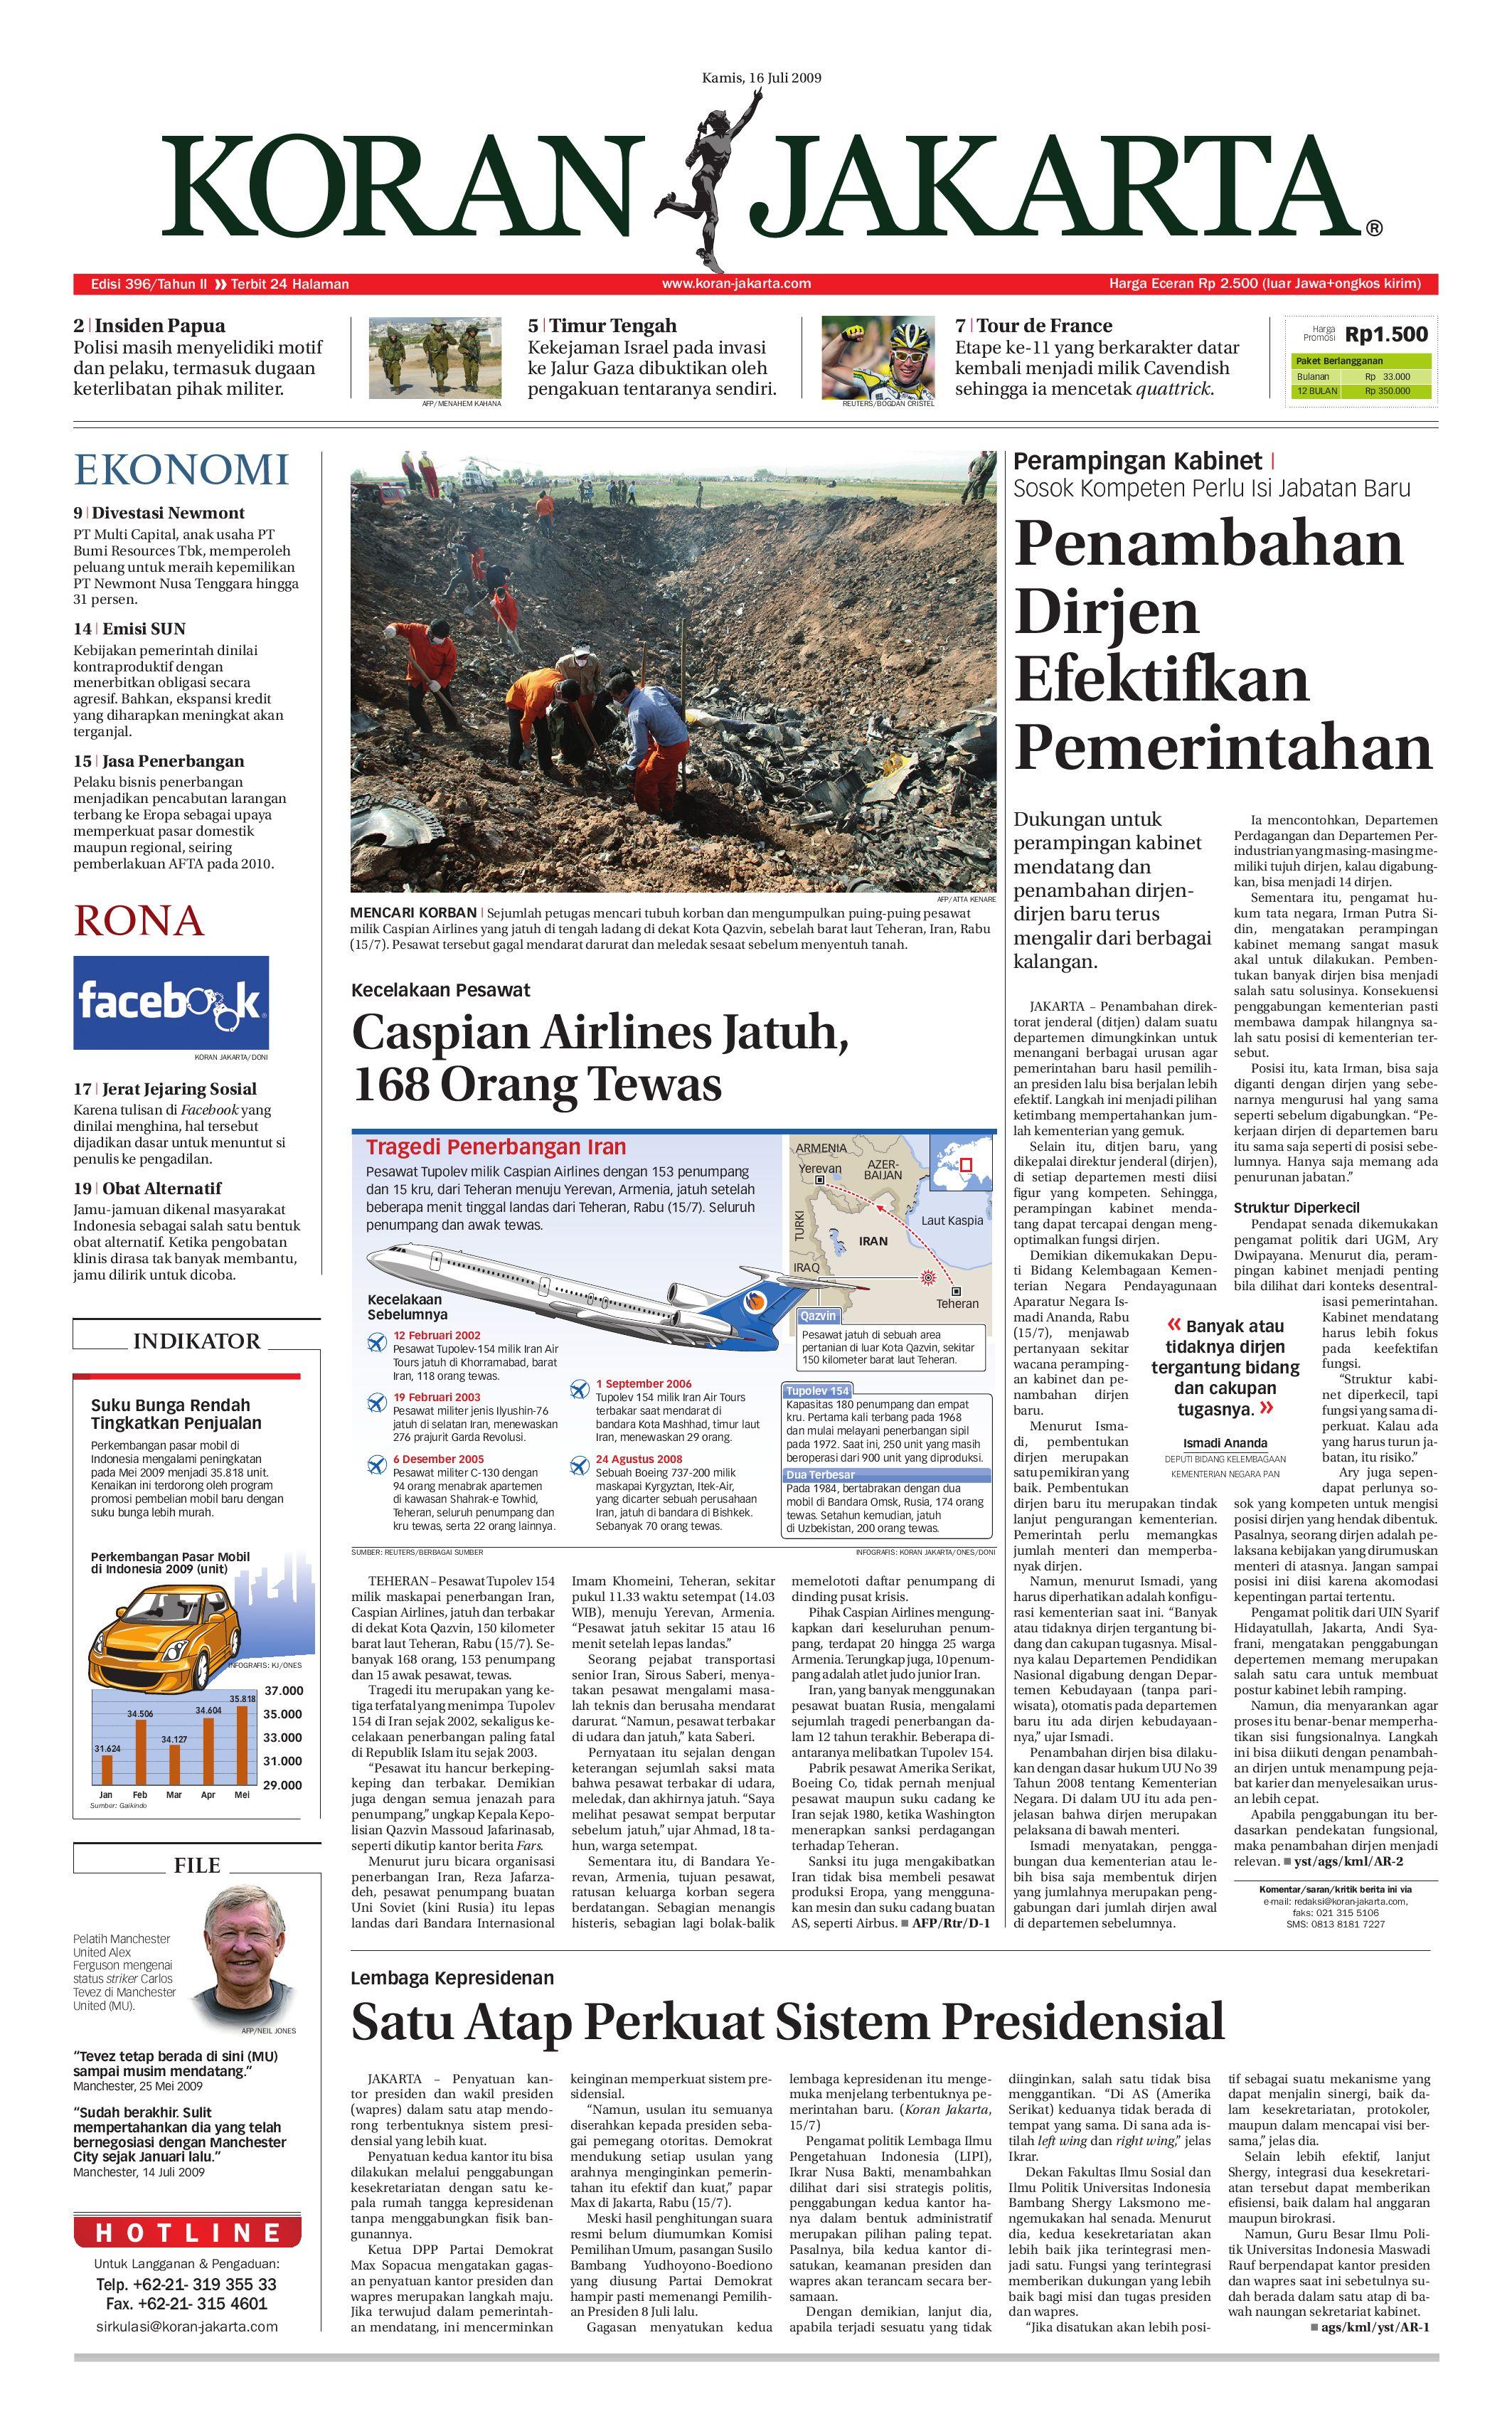 Edisi 396 16 Juli 2009 By Pt Berita Nusantara Issuu Produk Ukm Bumn Gula Jawa 1 2 Kg Free Ongkir Area Depok